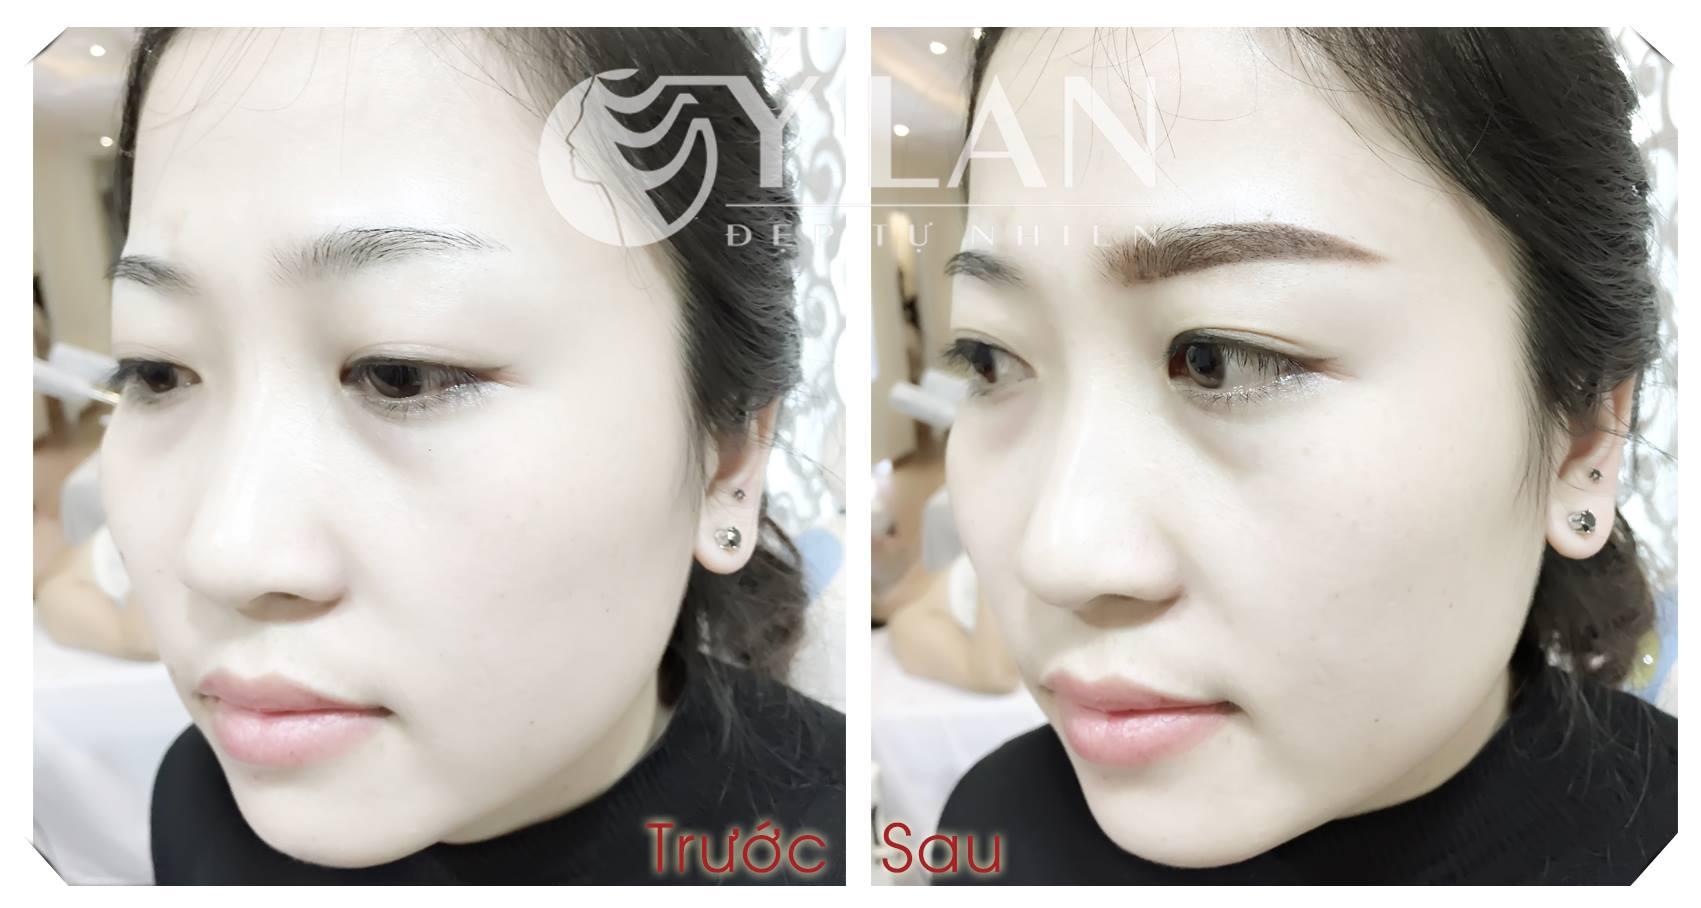 long-may-ngan-thua-duoc-khac-phuc-tai-tham-my-vien-y-lan